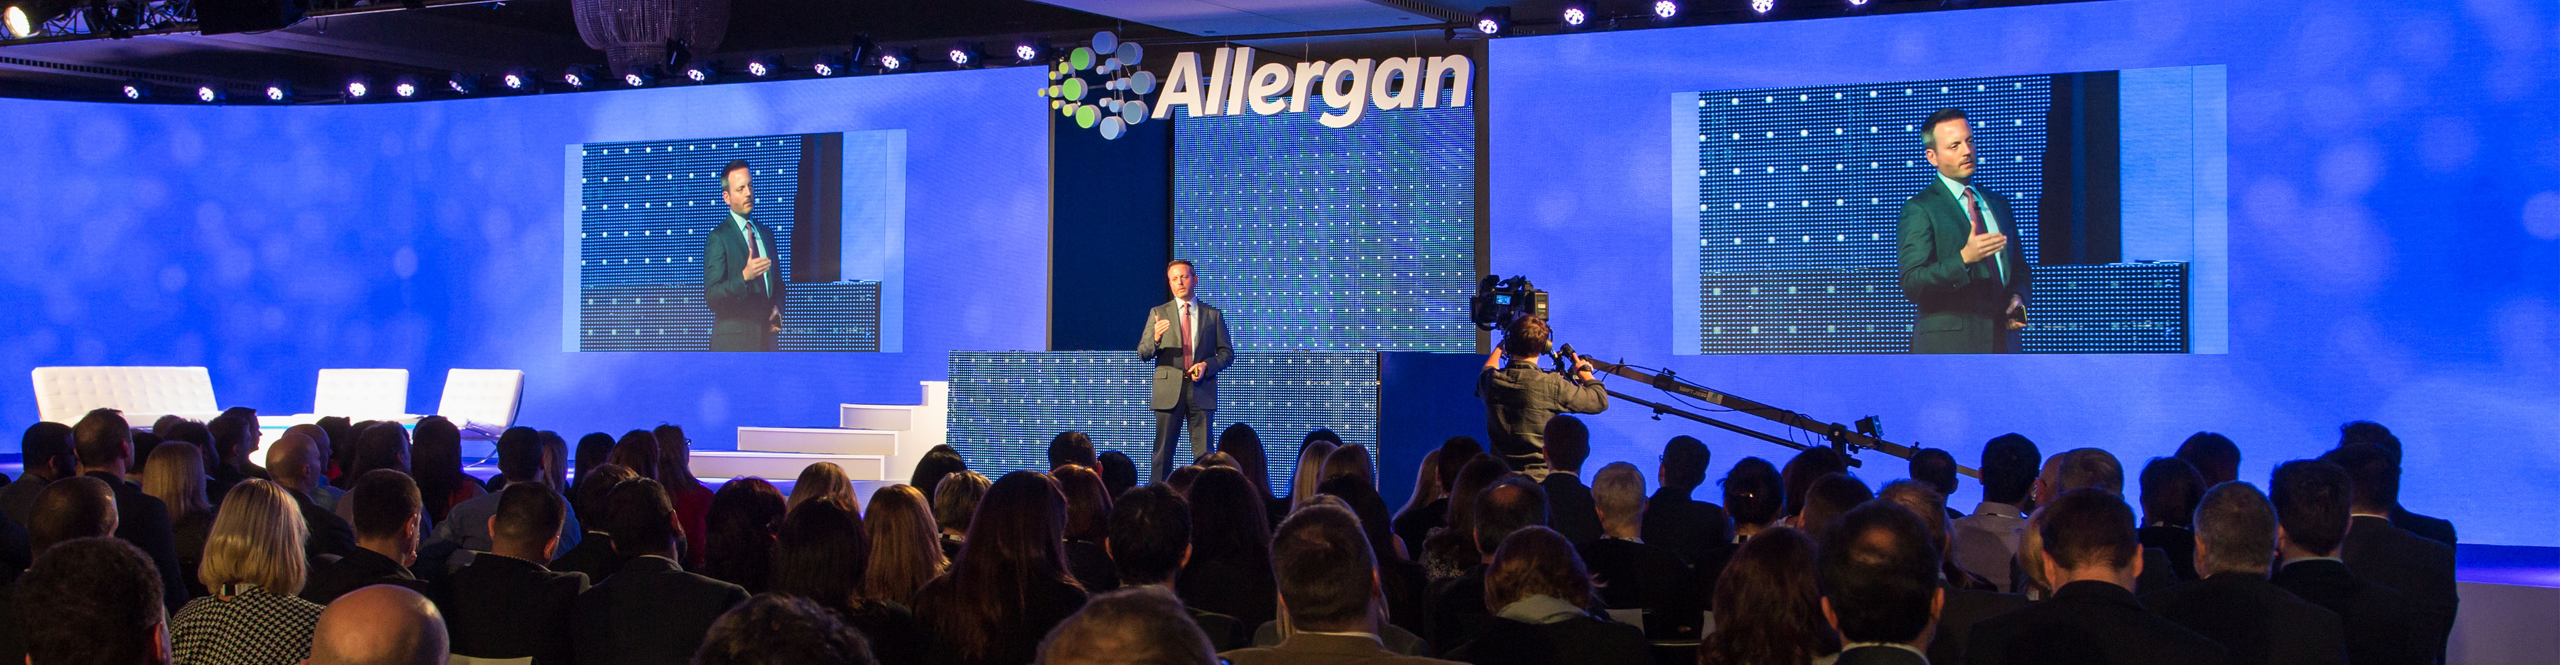 Allergan Conference